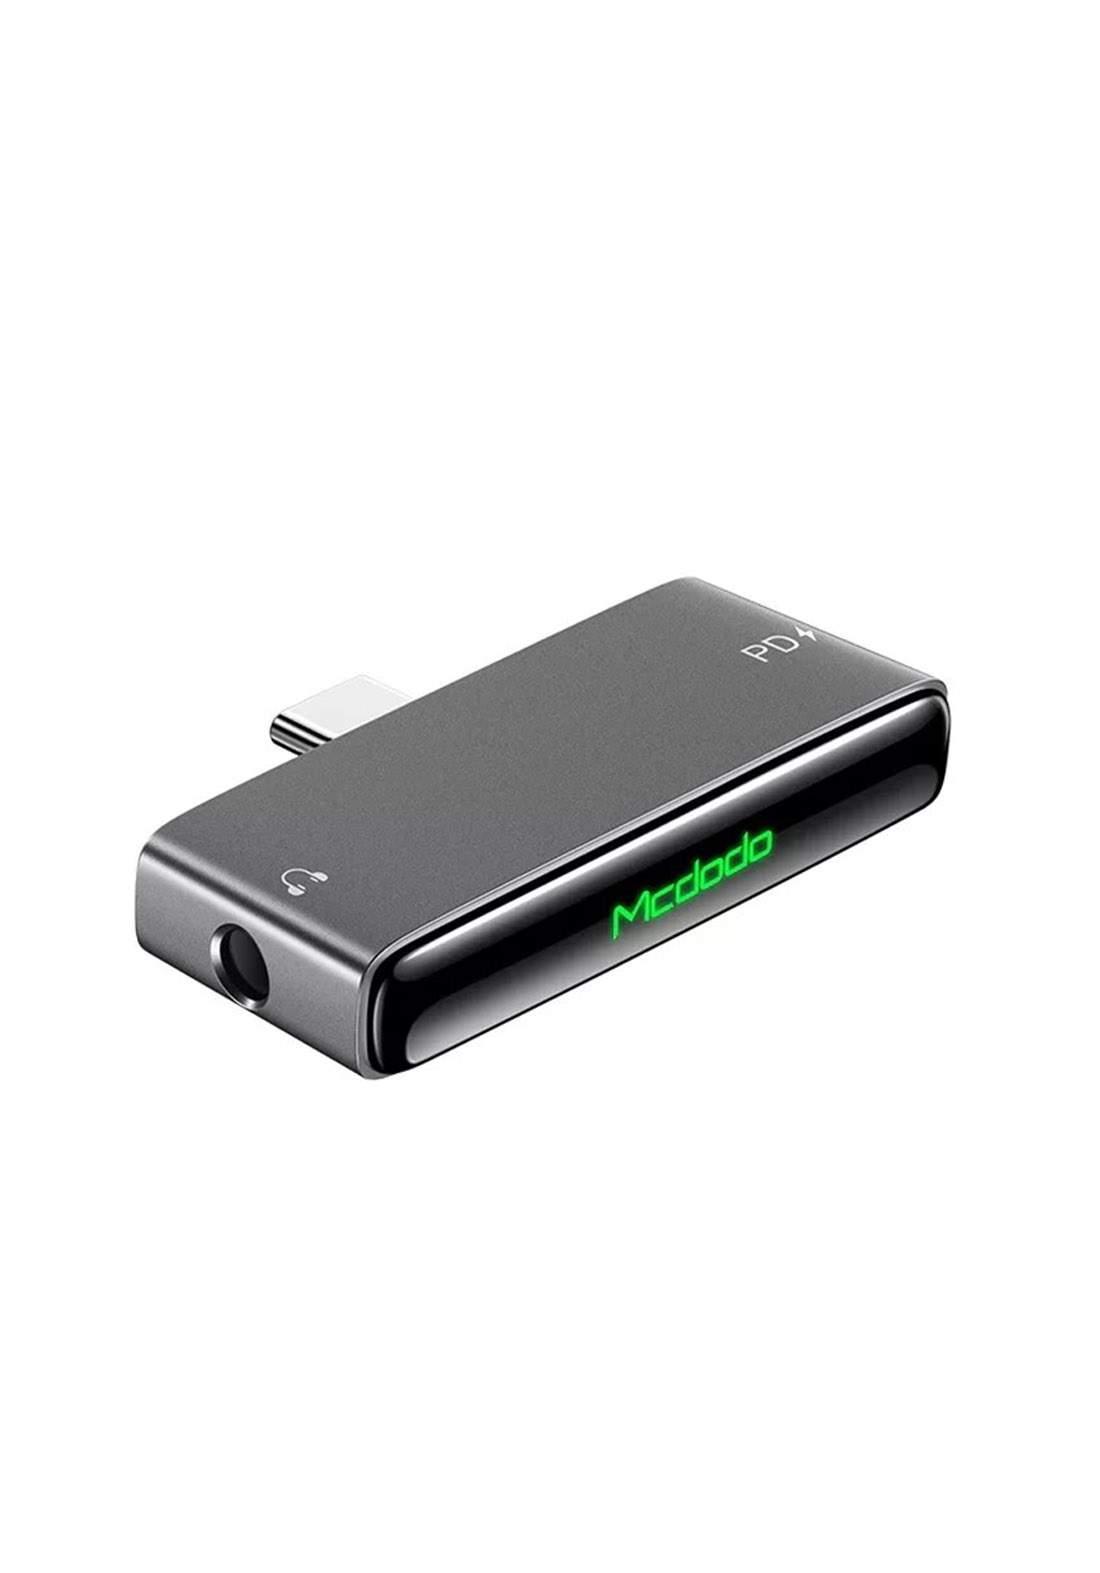 Mcdodo CA07660 Type-C Audio Adapter 60 W - Gray تحويلة